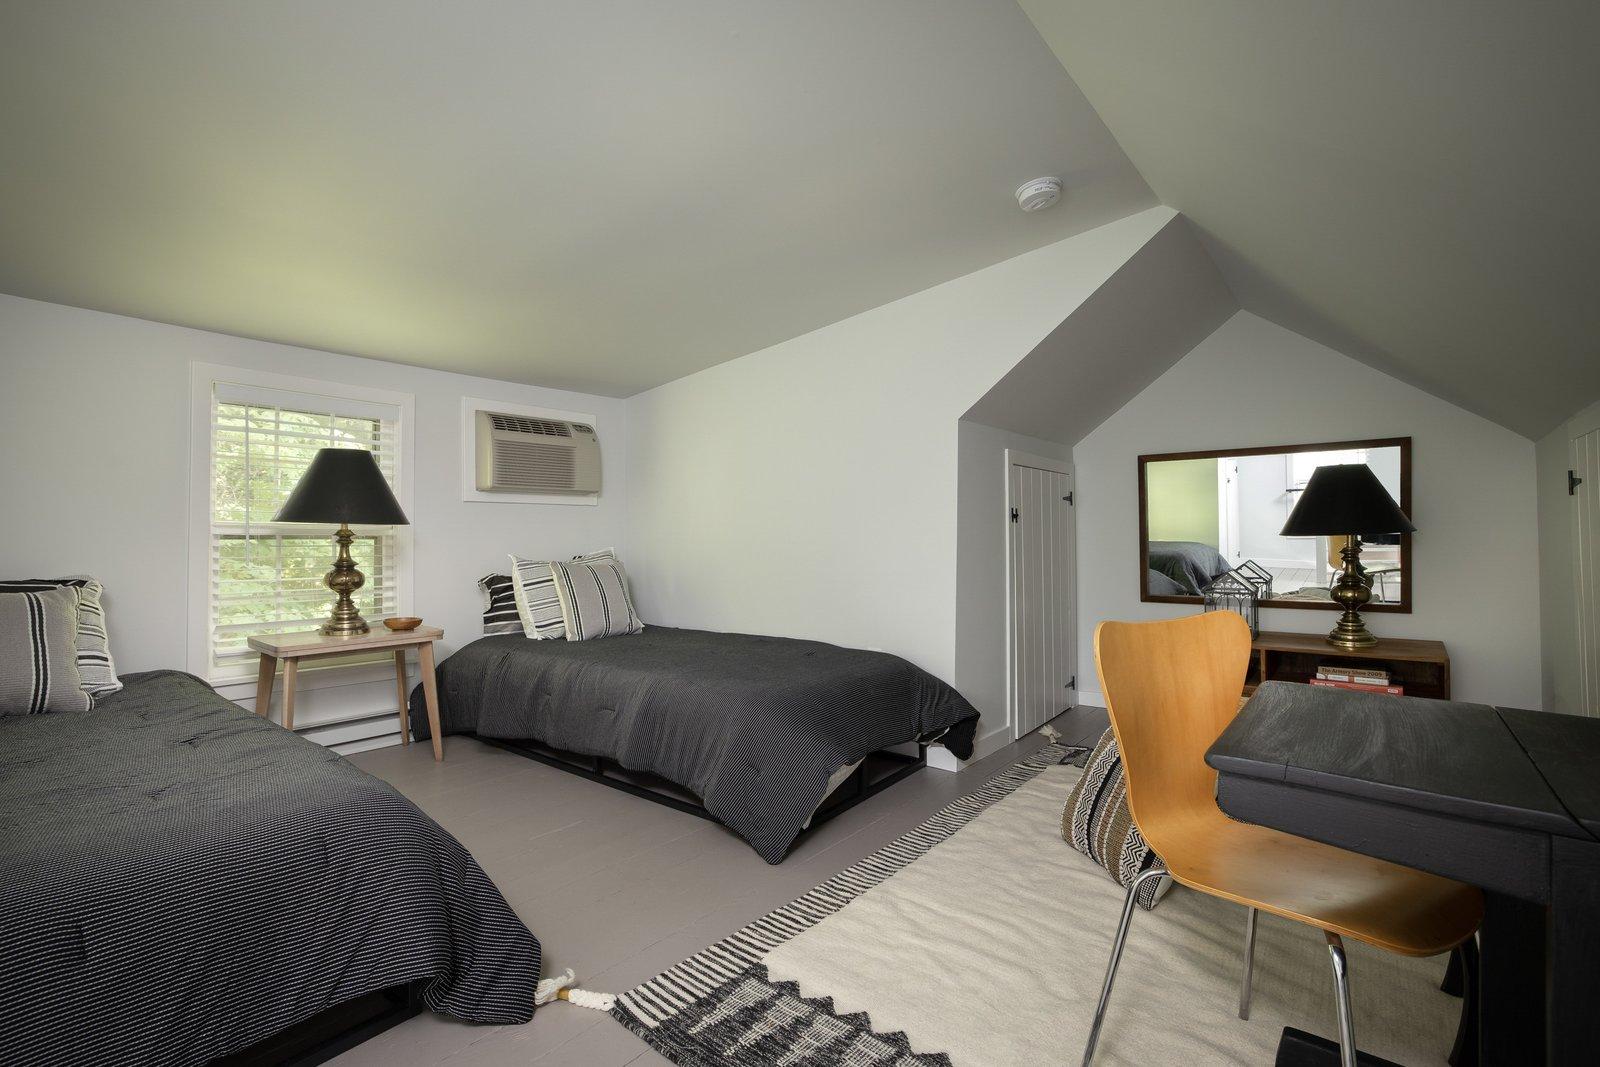 New England–style cottage loft bedroom